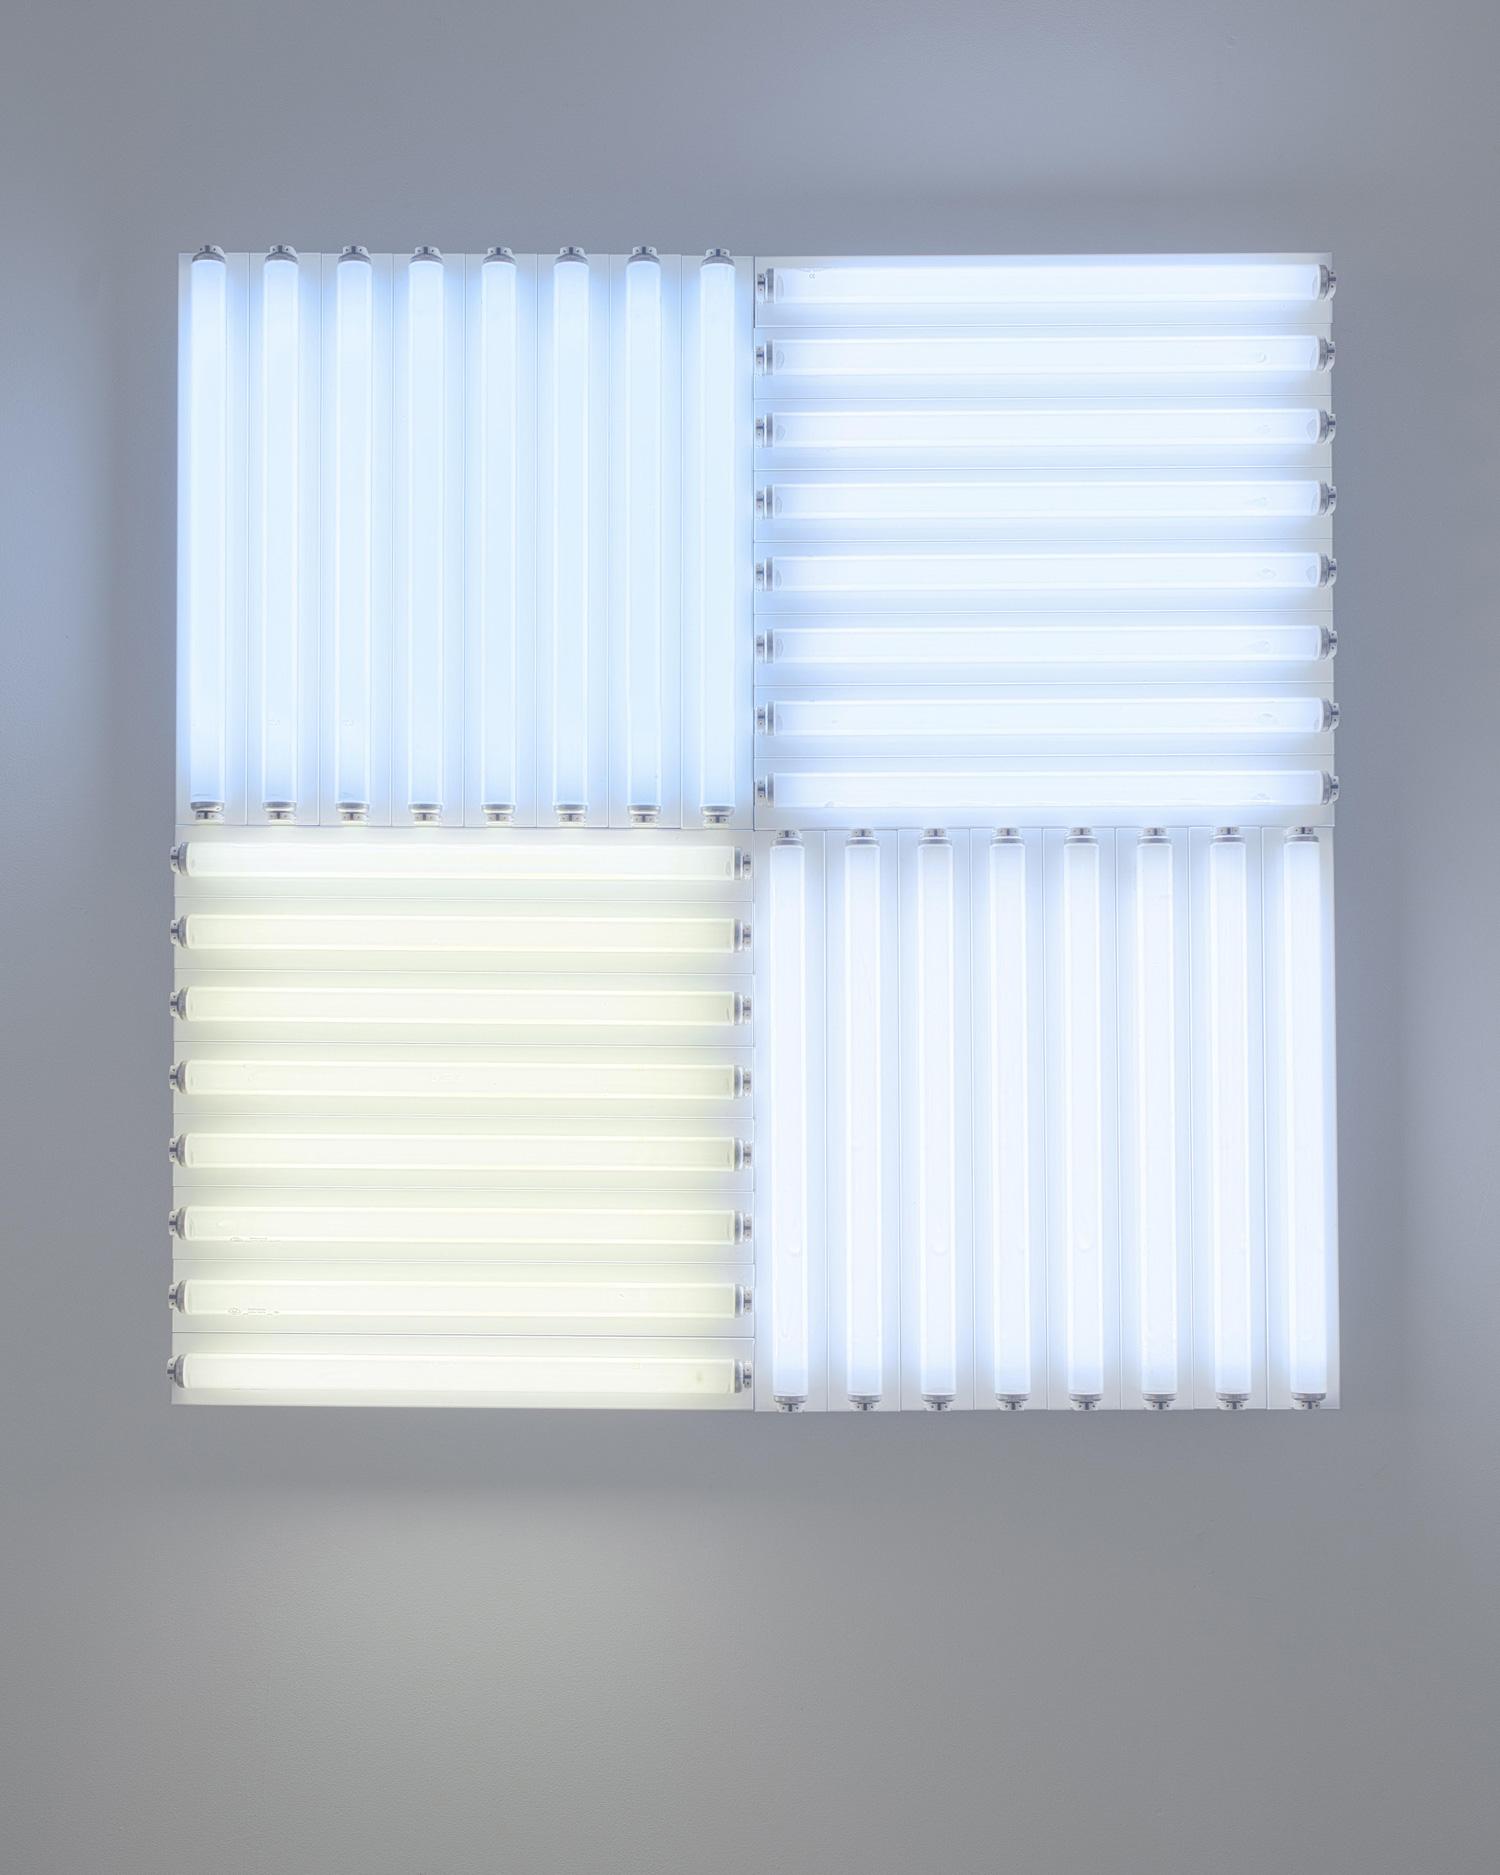 light-squares-cool.jpg